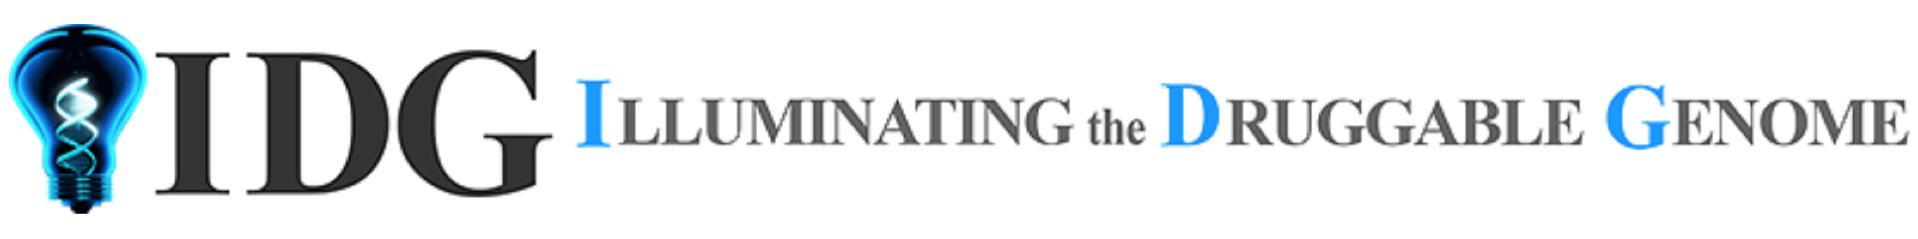 IDG+logo.jpg